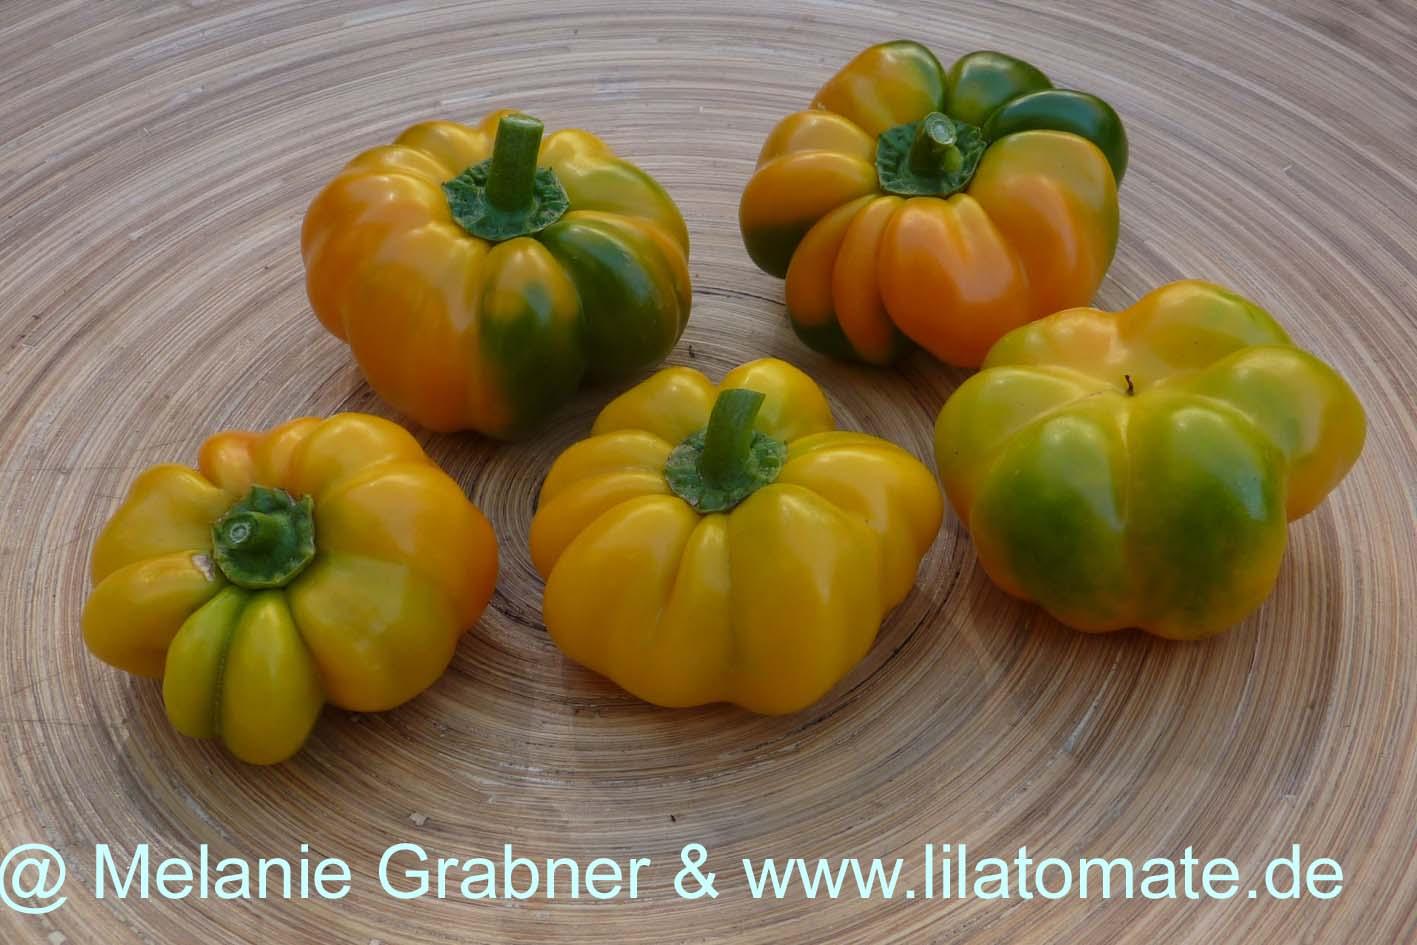 Paprika 'Tomatenpaprika, gelb' Saatgut